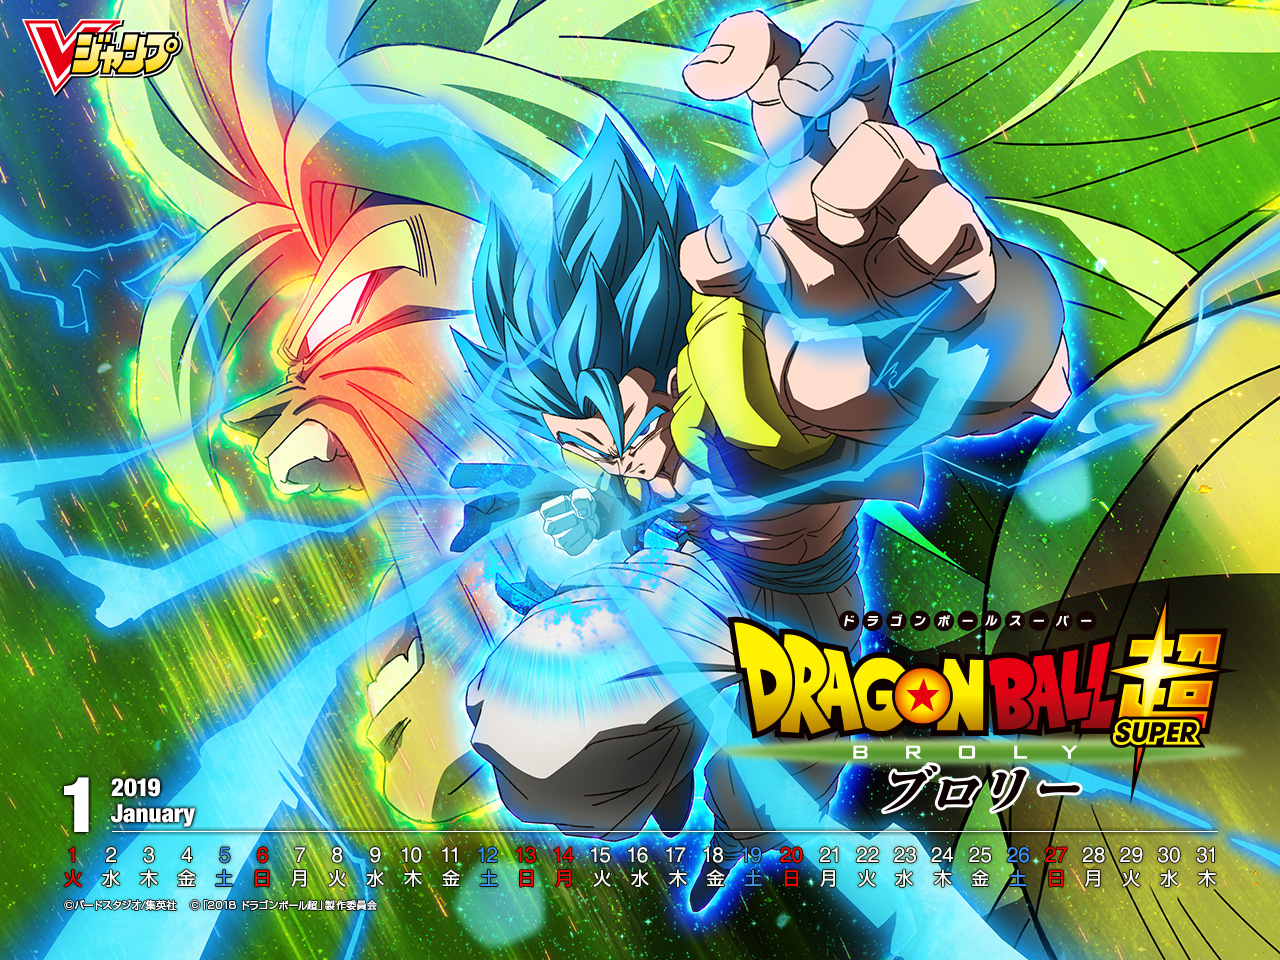 Dragon Ball Super: Broly Wallpaper #2455462 - Zerochan ...